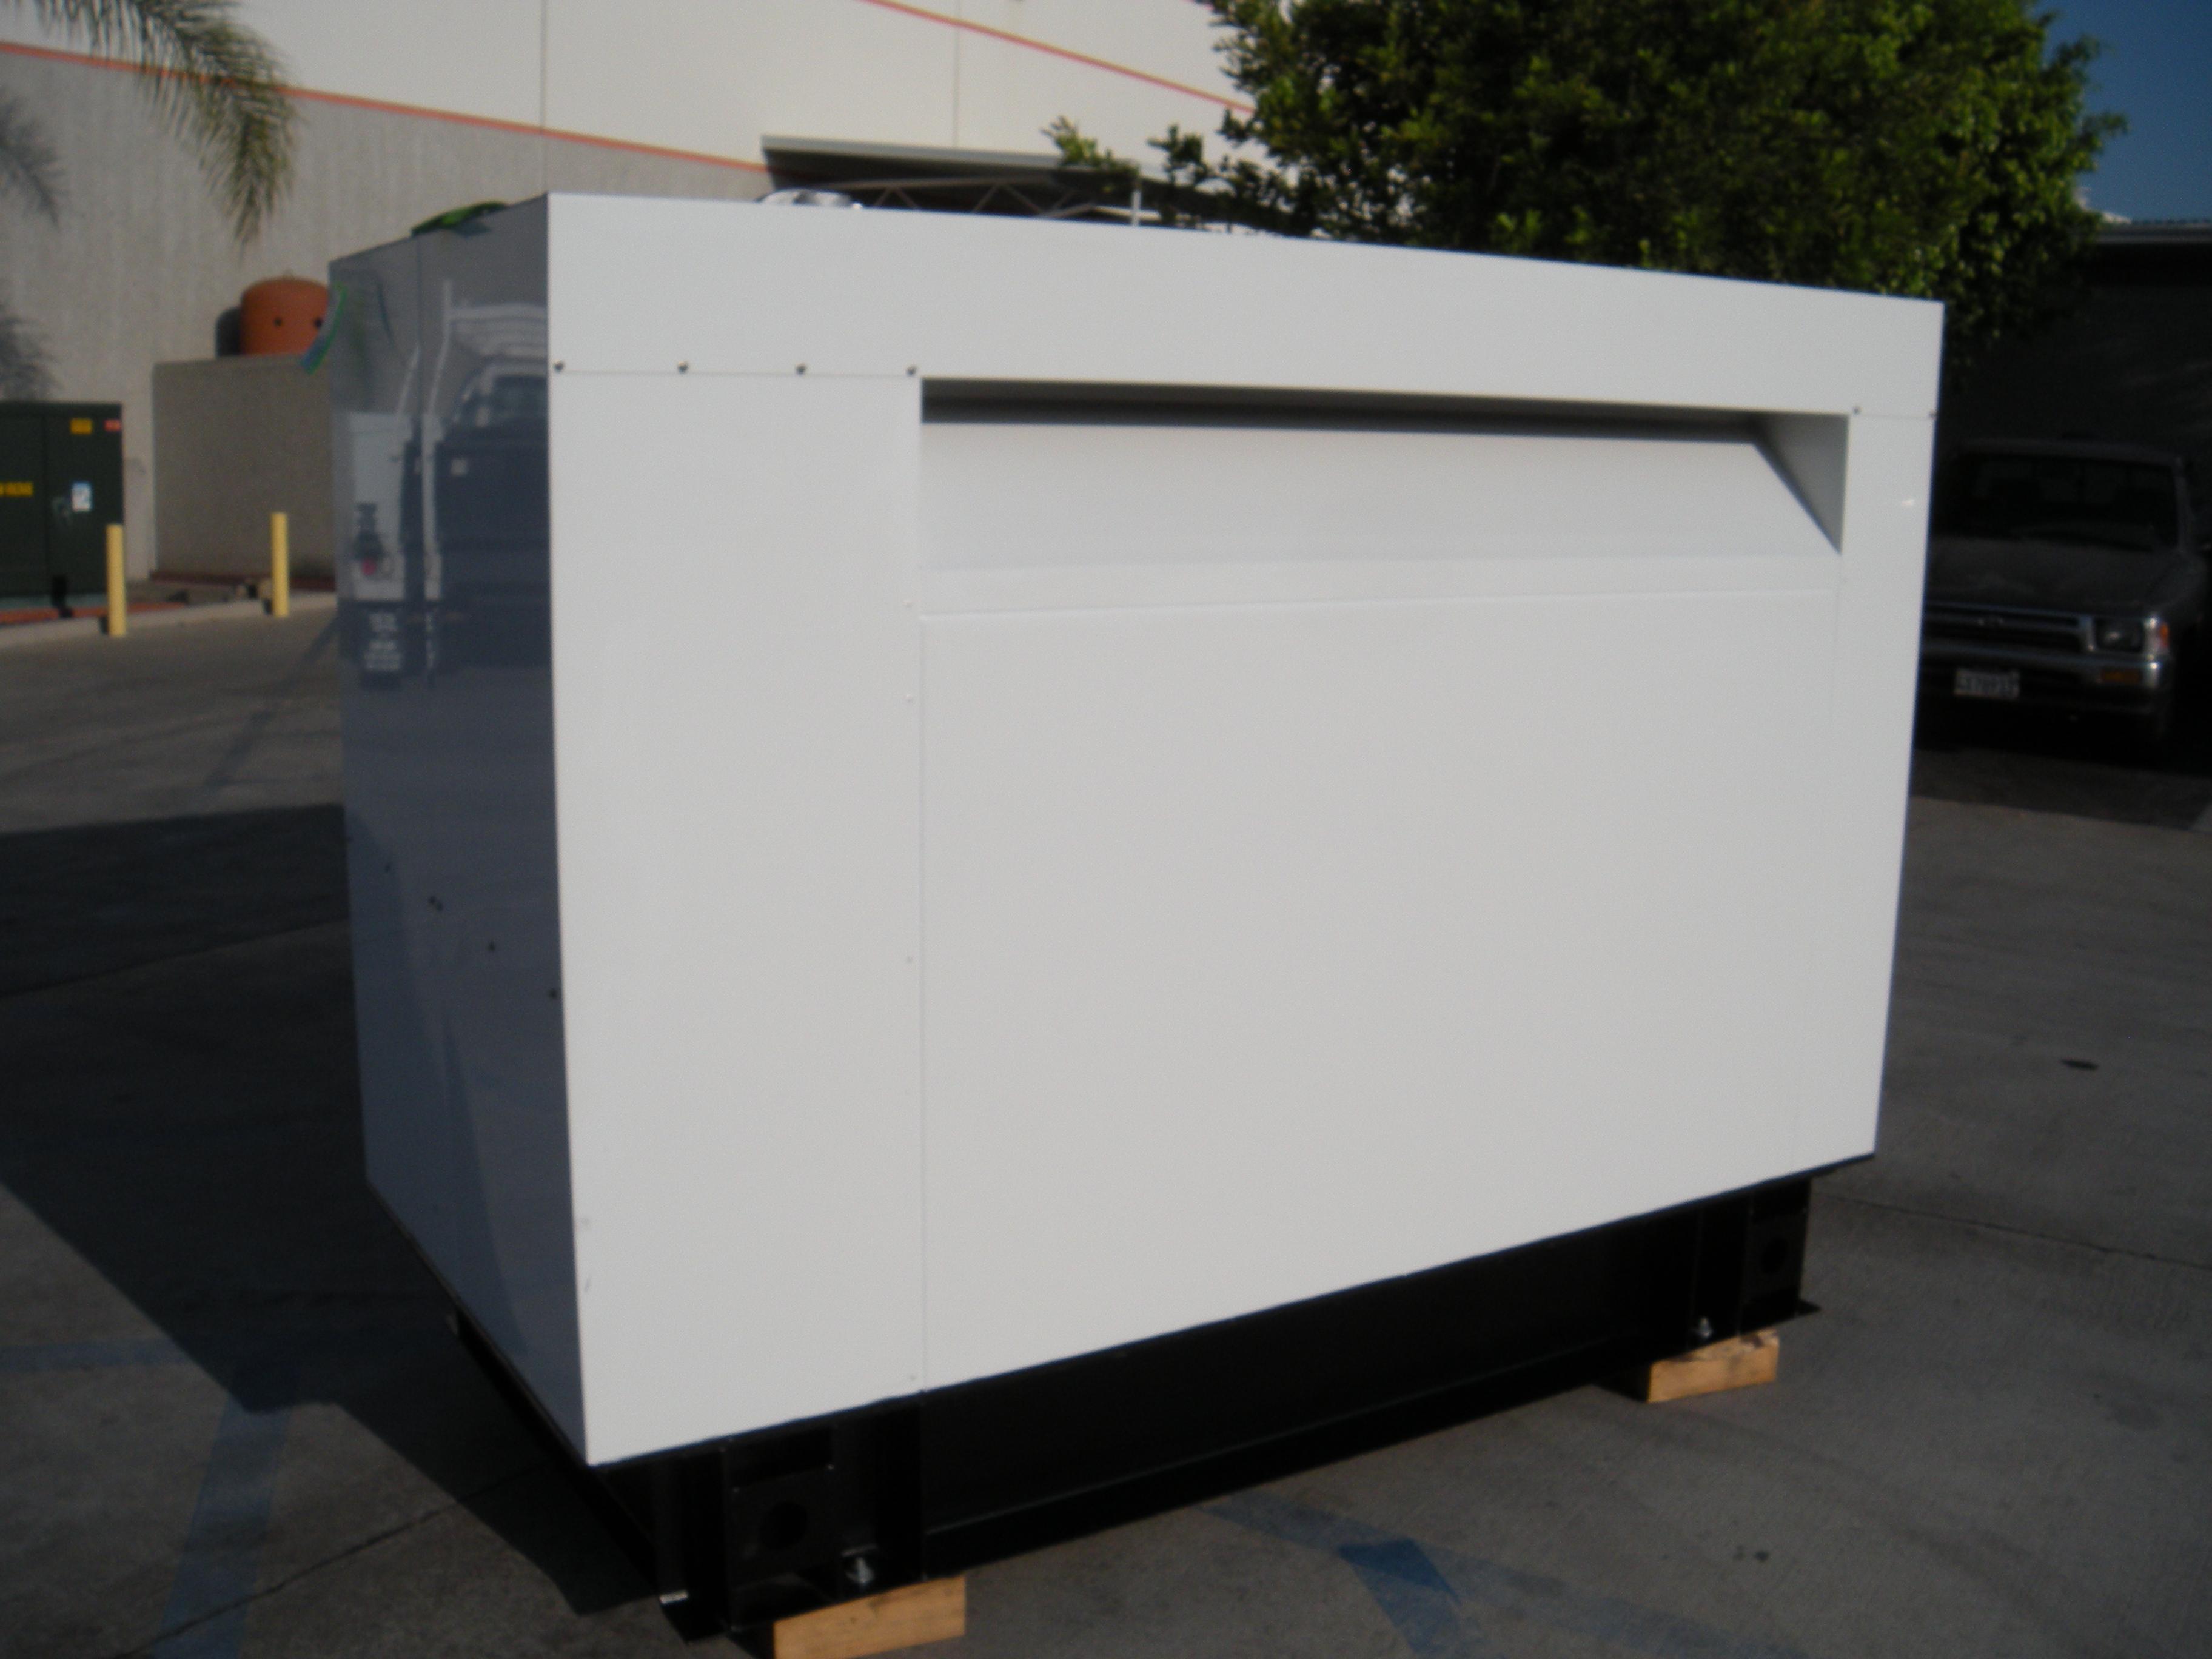 Multiquip Industrial Diesel Generator 30 kW 120 240V Single Phase